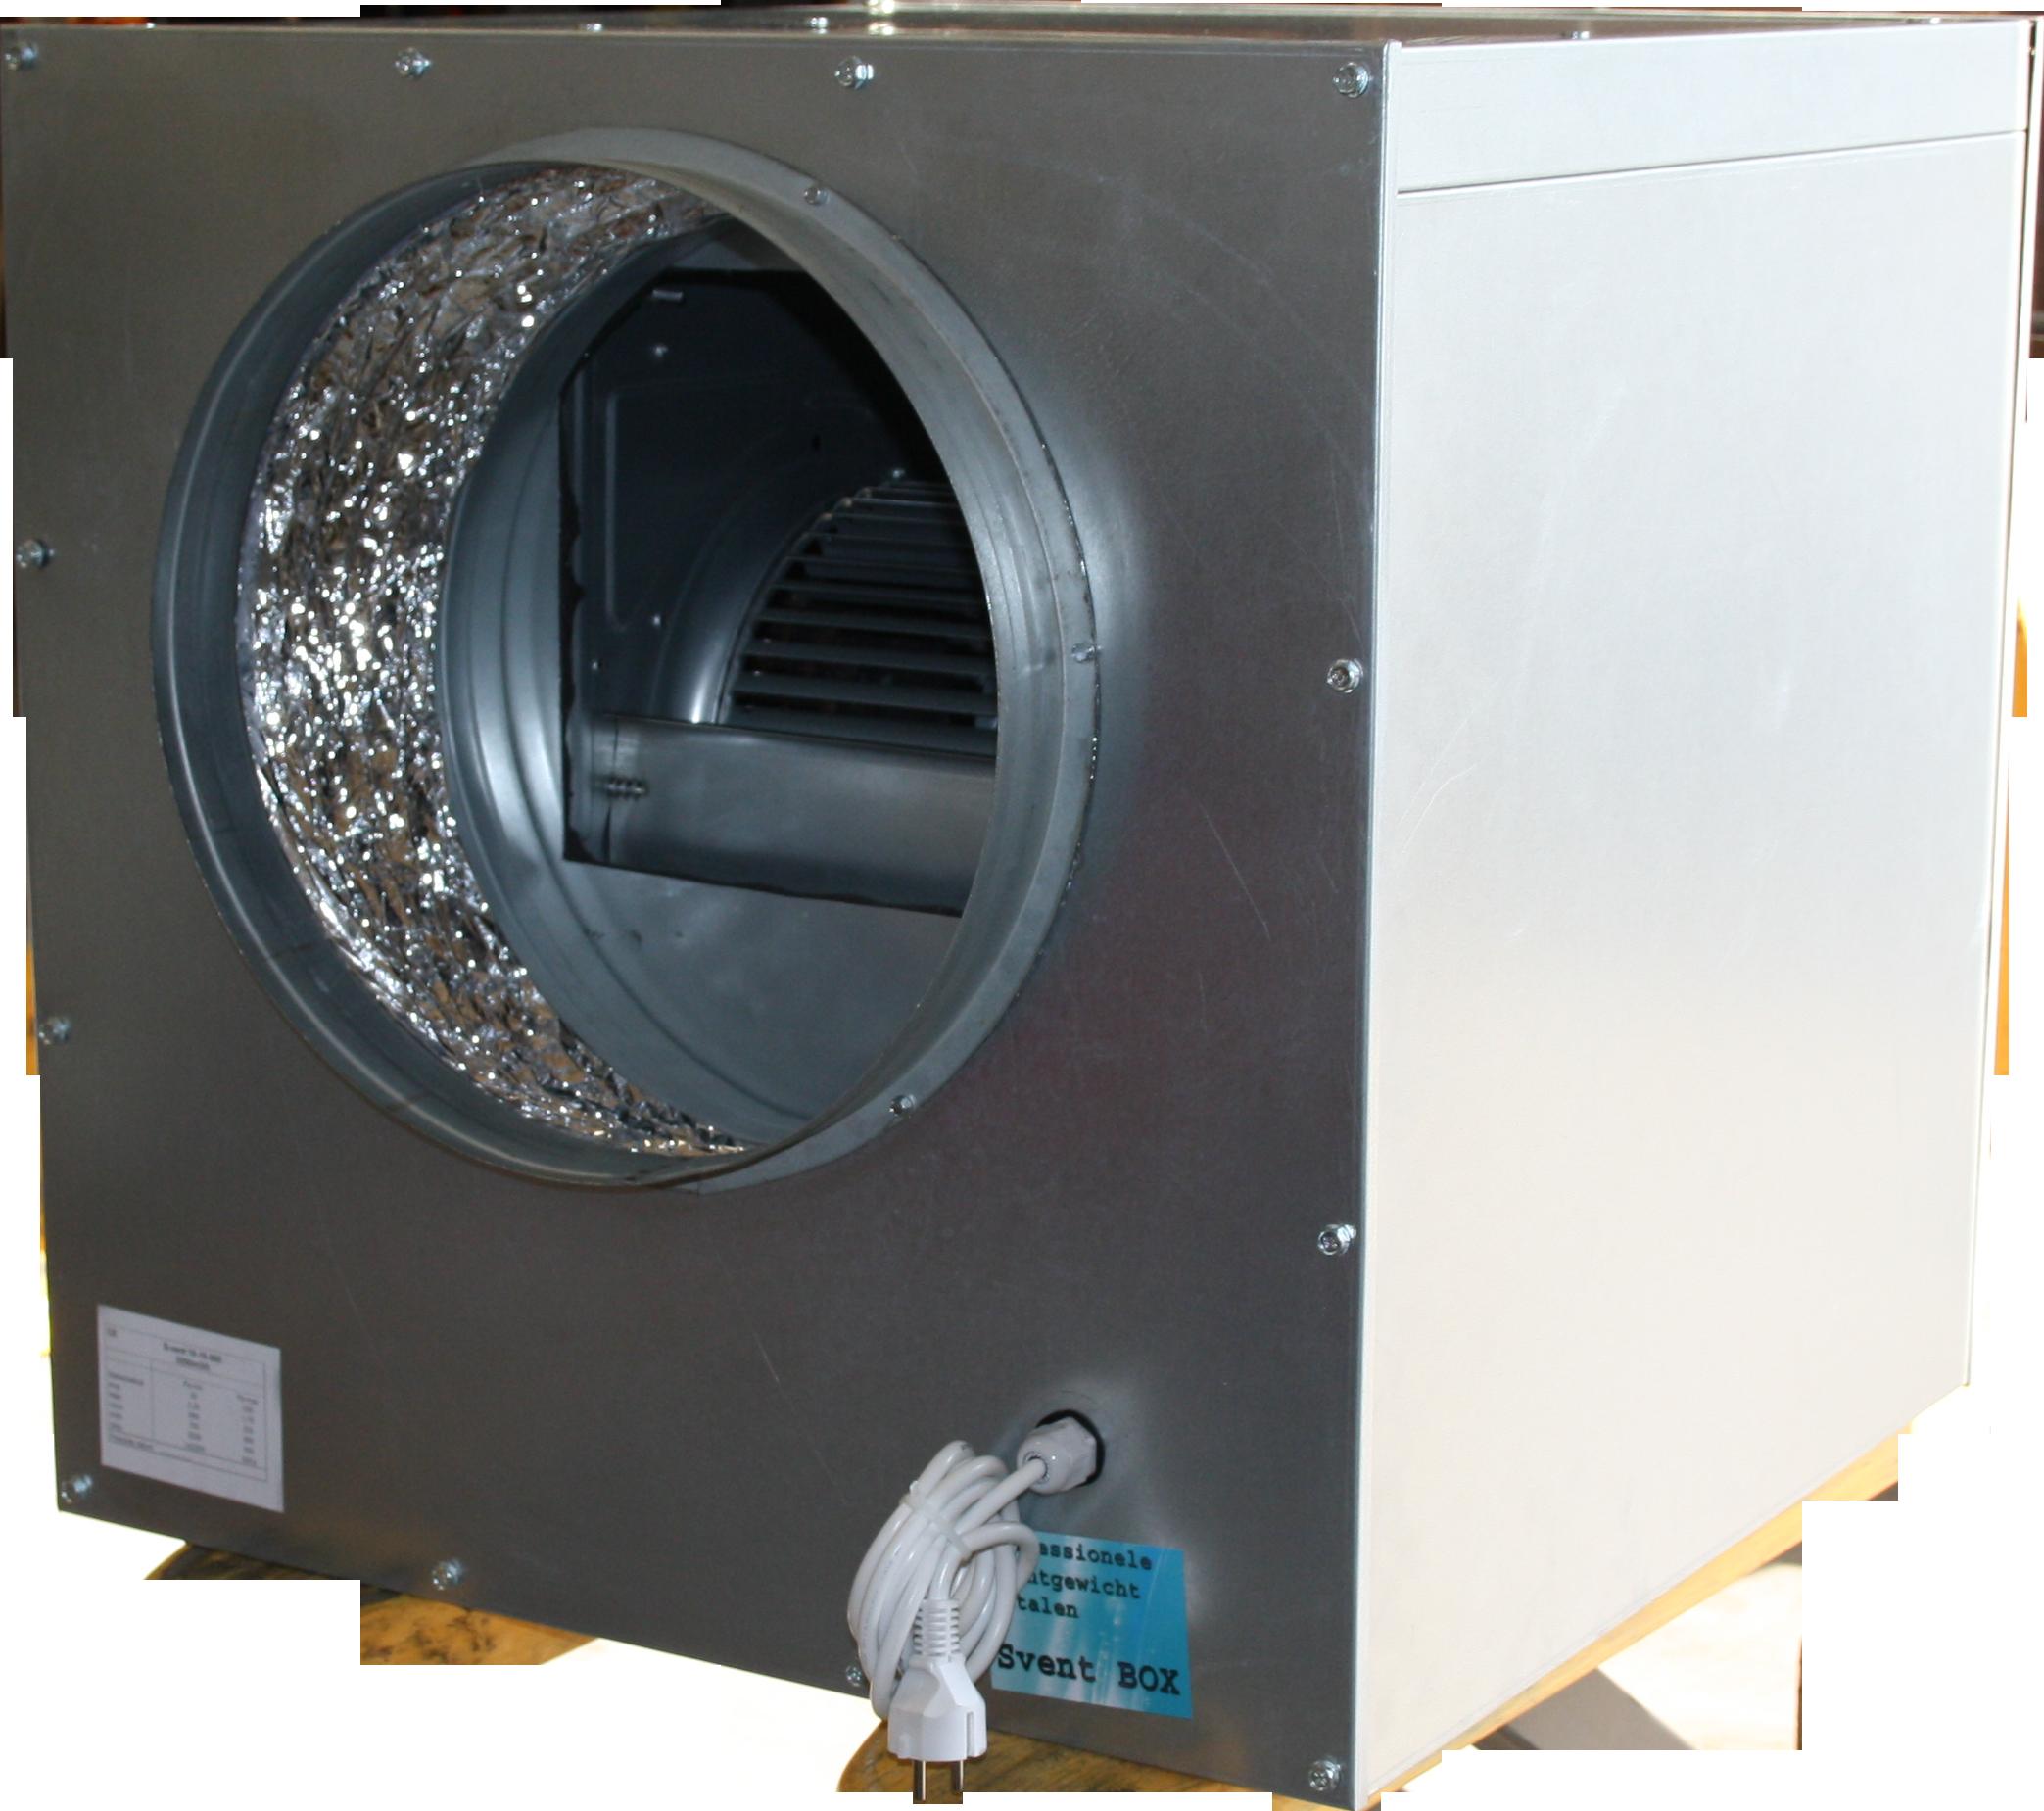 Spirototaal.nl Soft box ventilator 2650m3